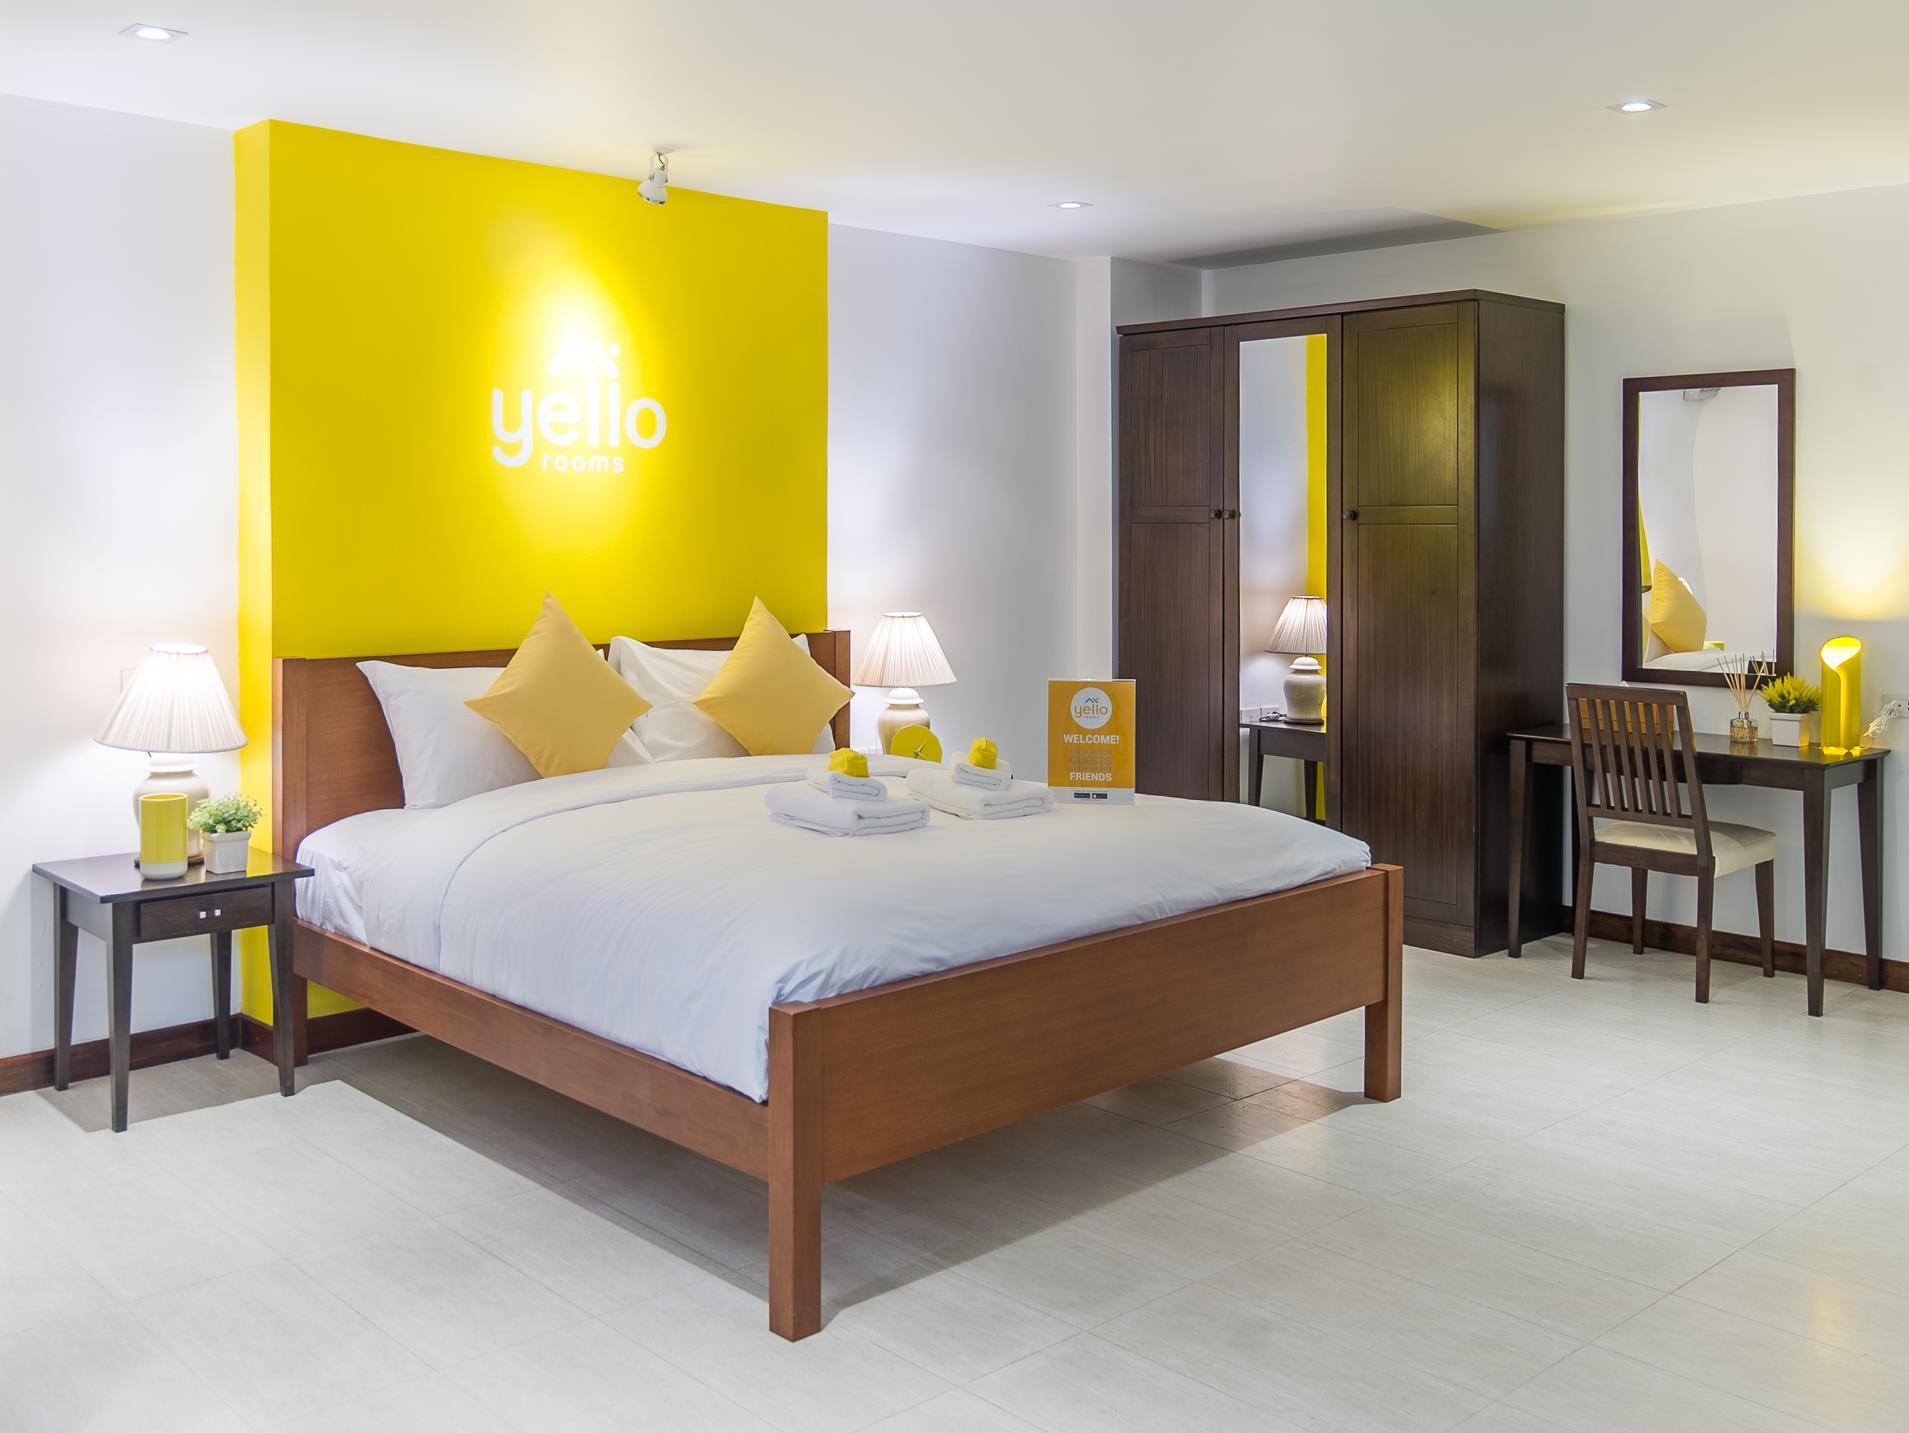 Yello Rooms, Pom Pram Sattru